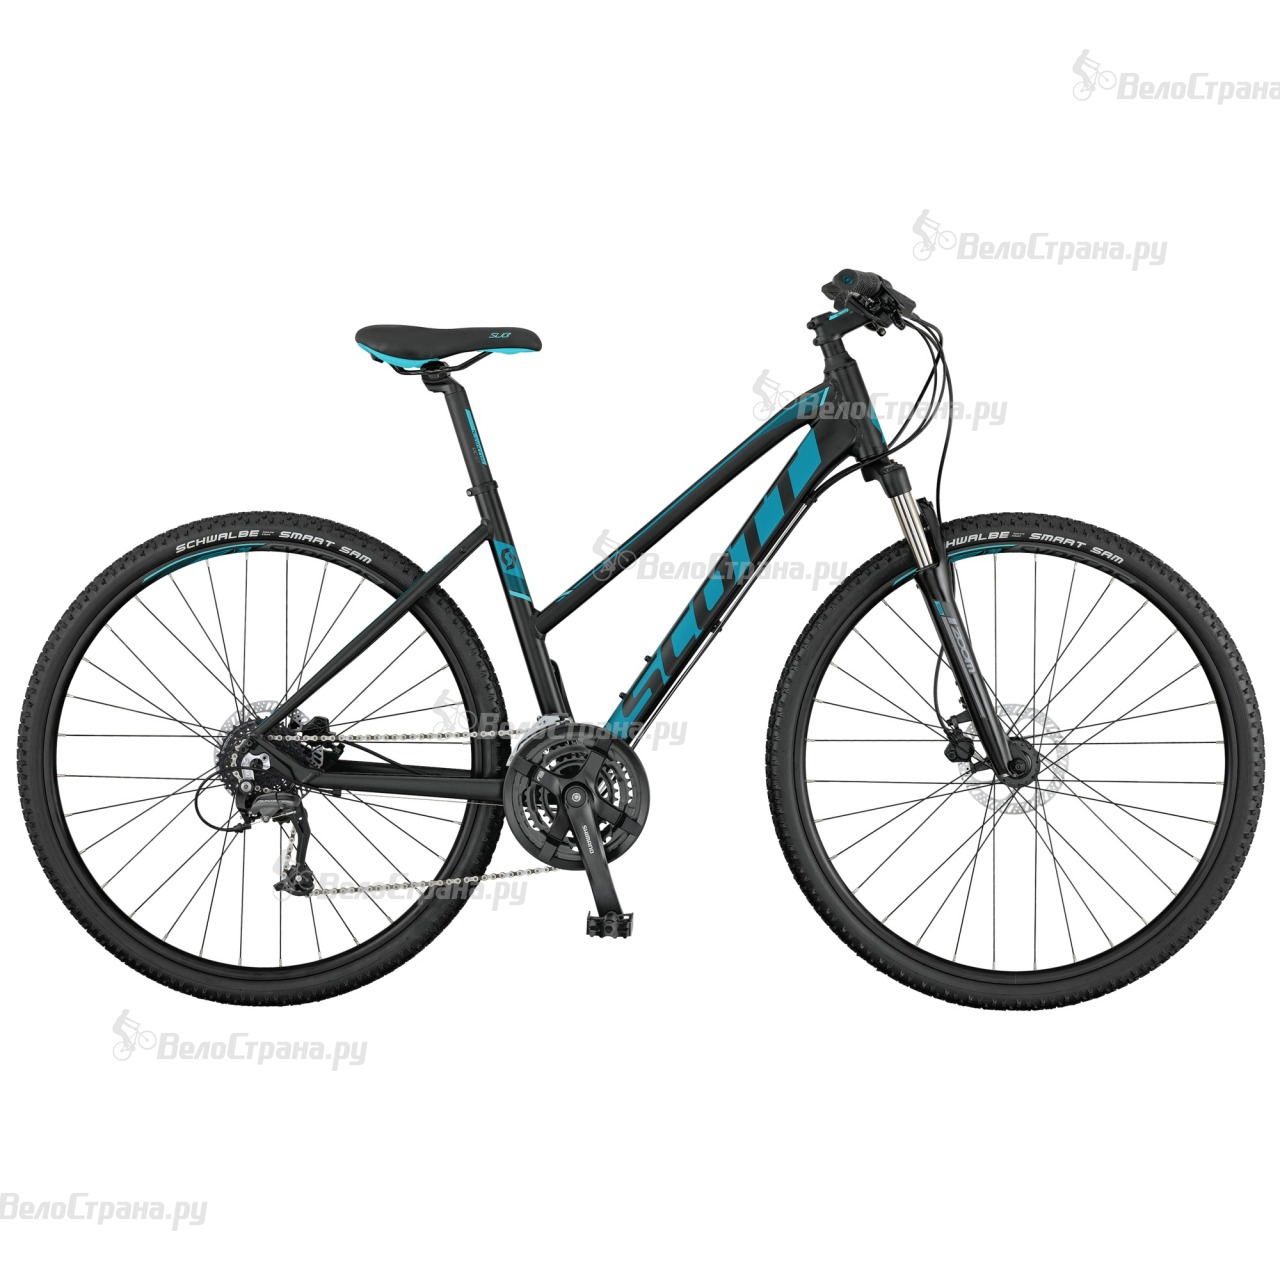 Велосипед Scott Sub Cross 40 Lady (2017) велосипед scott sub cross 30 men 2017